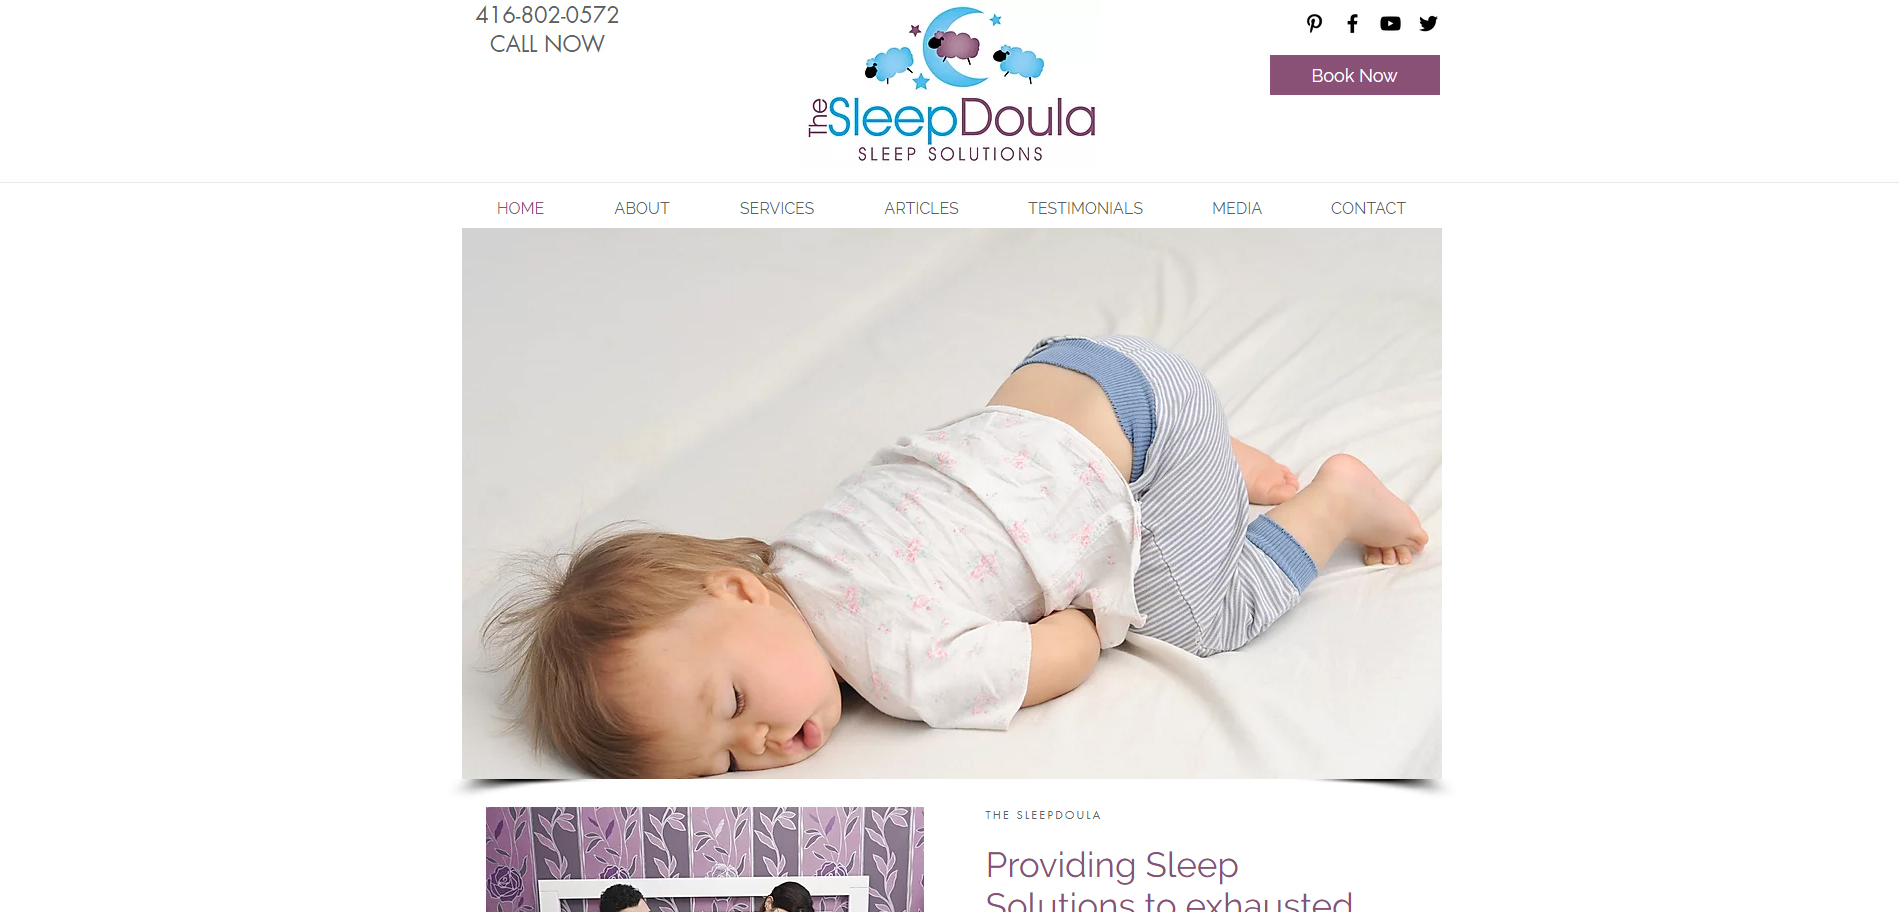 babysleepdoula-pregnancy-toronto-brampton-thewebmiraclebabyhelp-ontario-canada-websitemanagement-developer-webdesigner